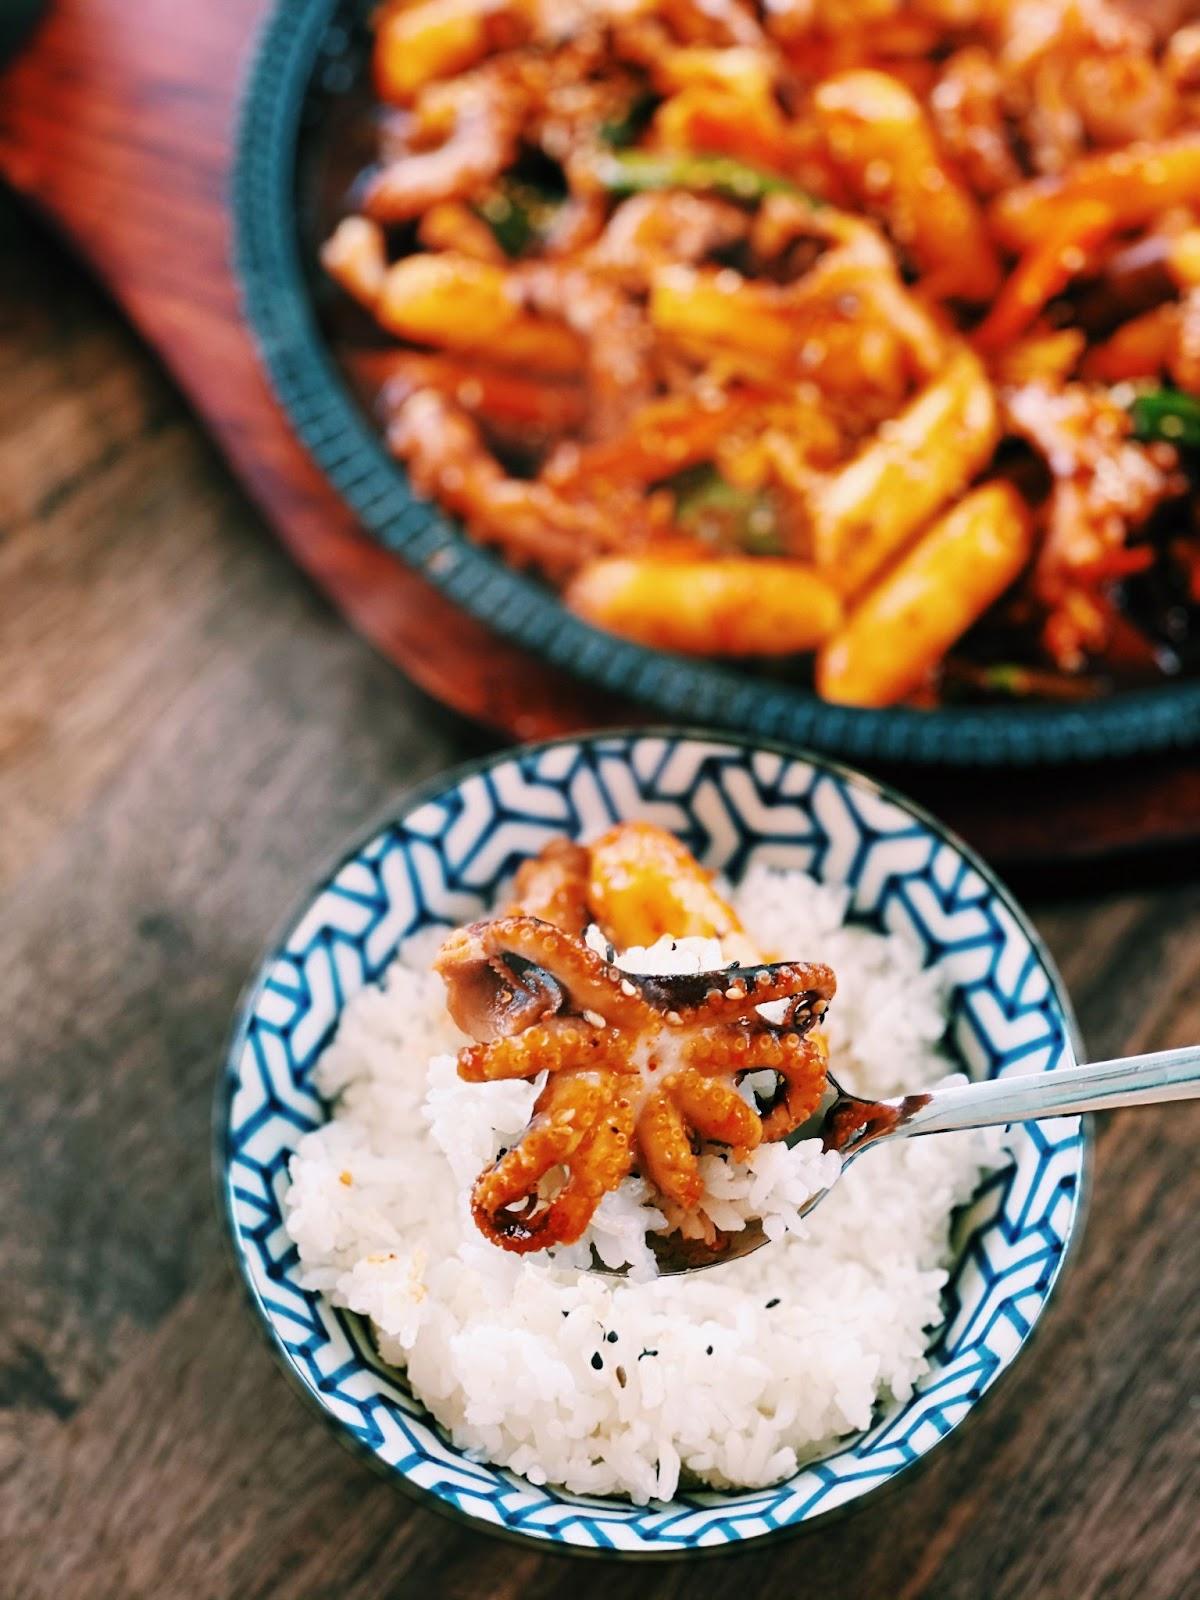 Korean Spicy Octopus Stir Fry